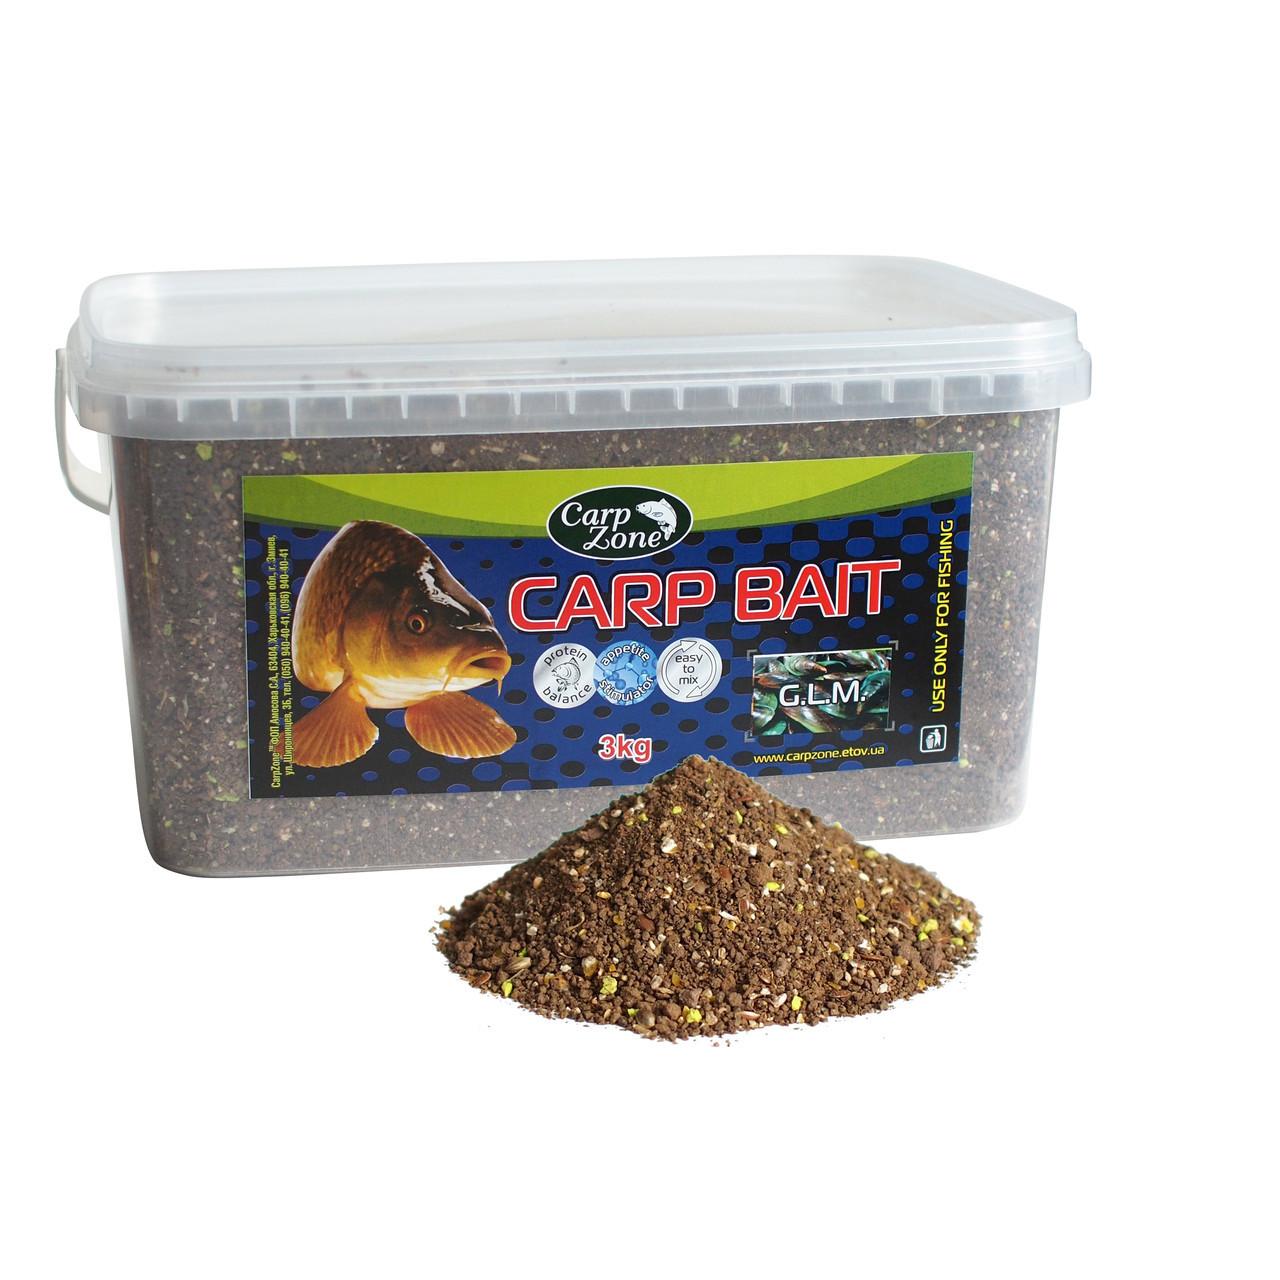 Прикормка Carp Bait G.L.M. (Зеленогубая мидия) 3 кг